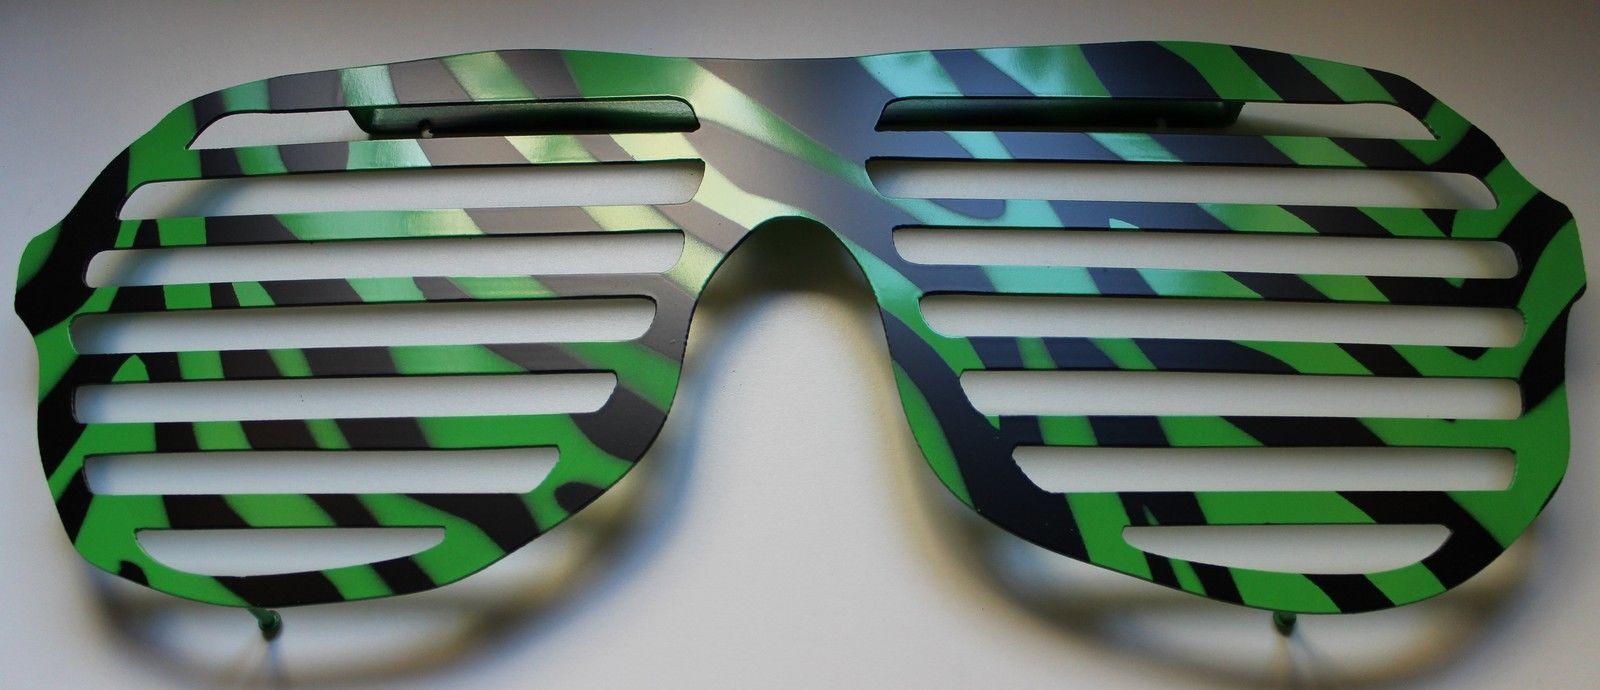 SUNGLASS RACK, Sunglasses to hold your Sunglases!-Green Zebra - $29.99